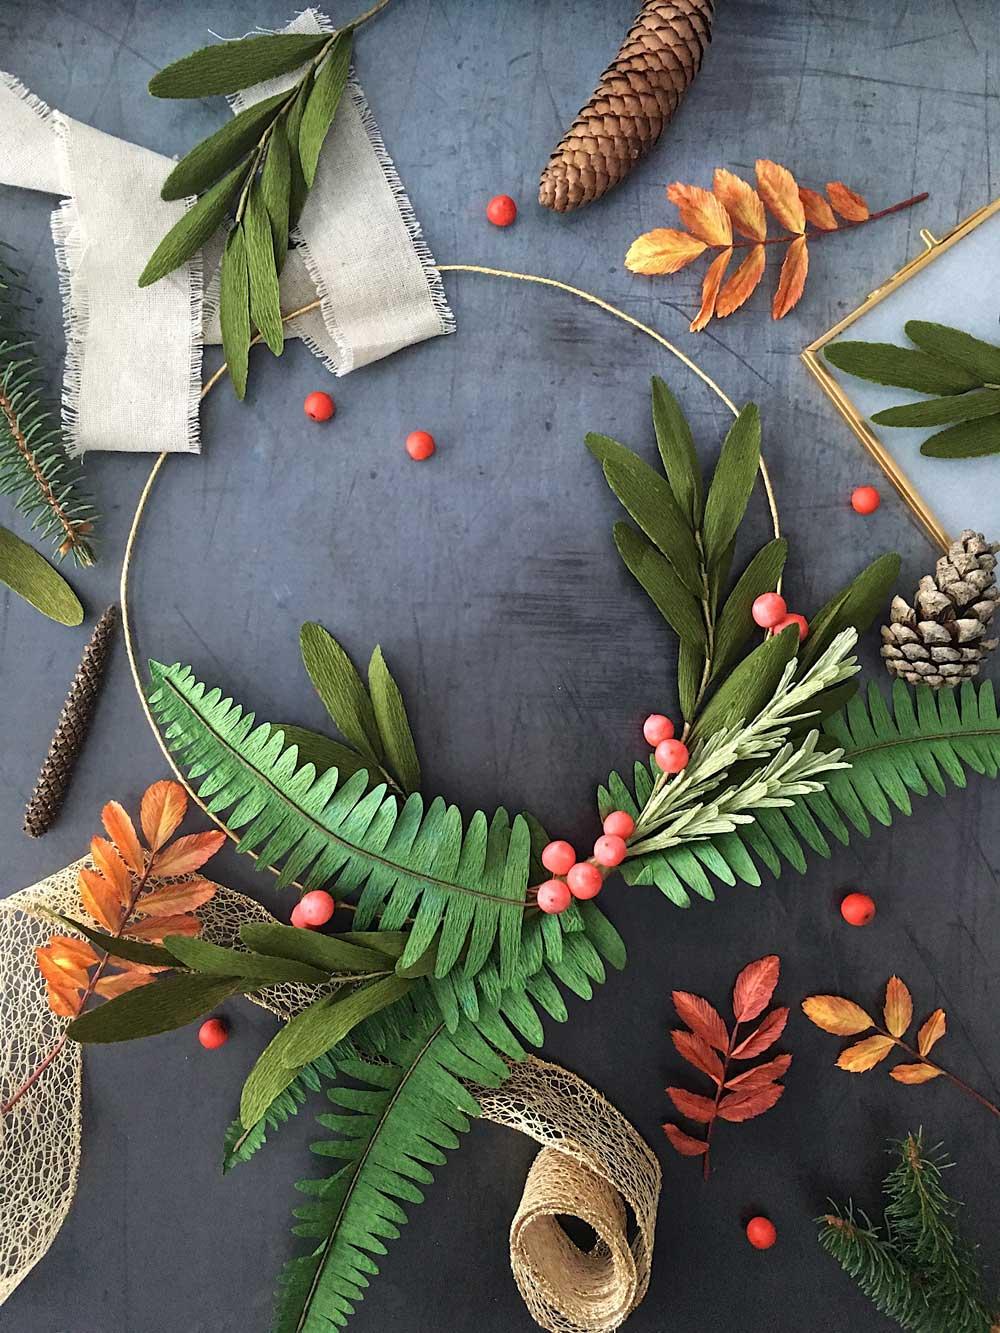 decorazioni-natalizie-carta-crespa-13